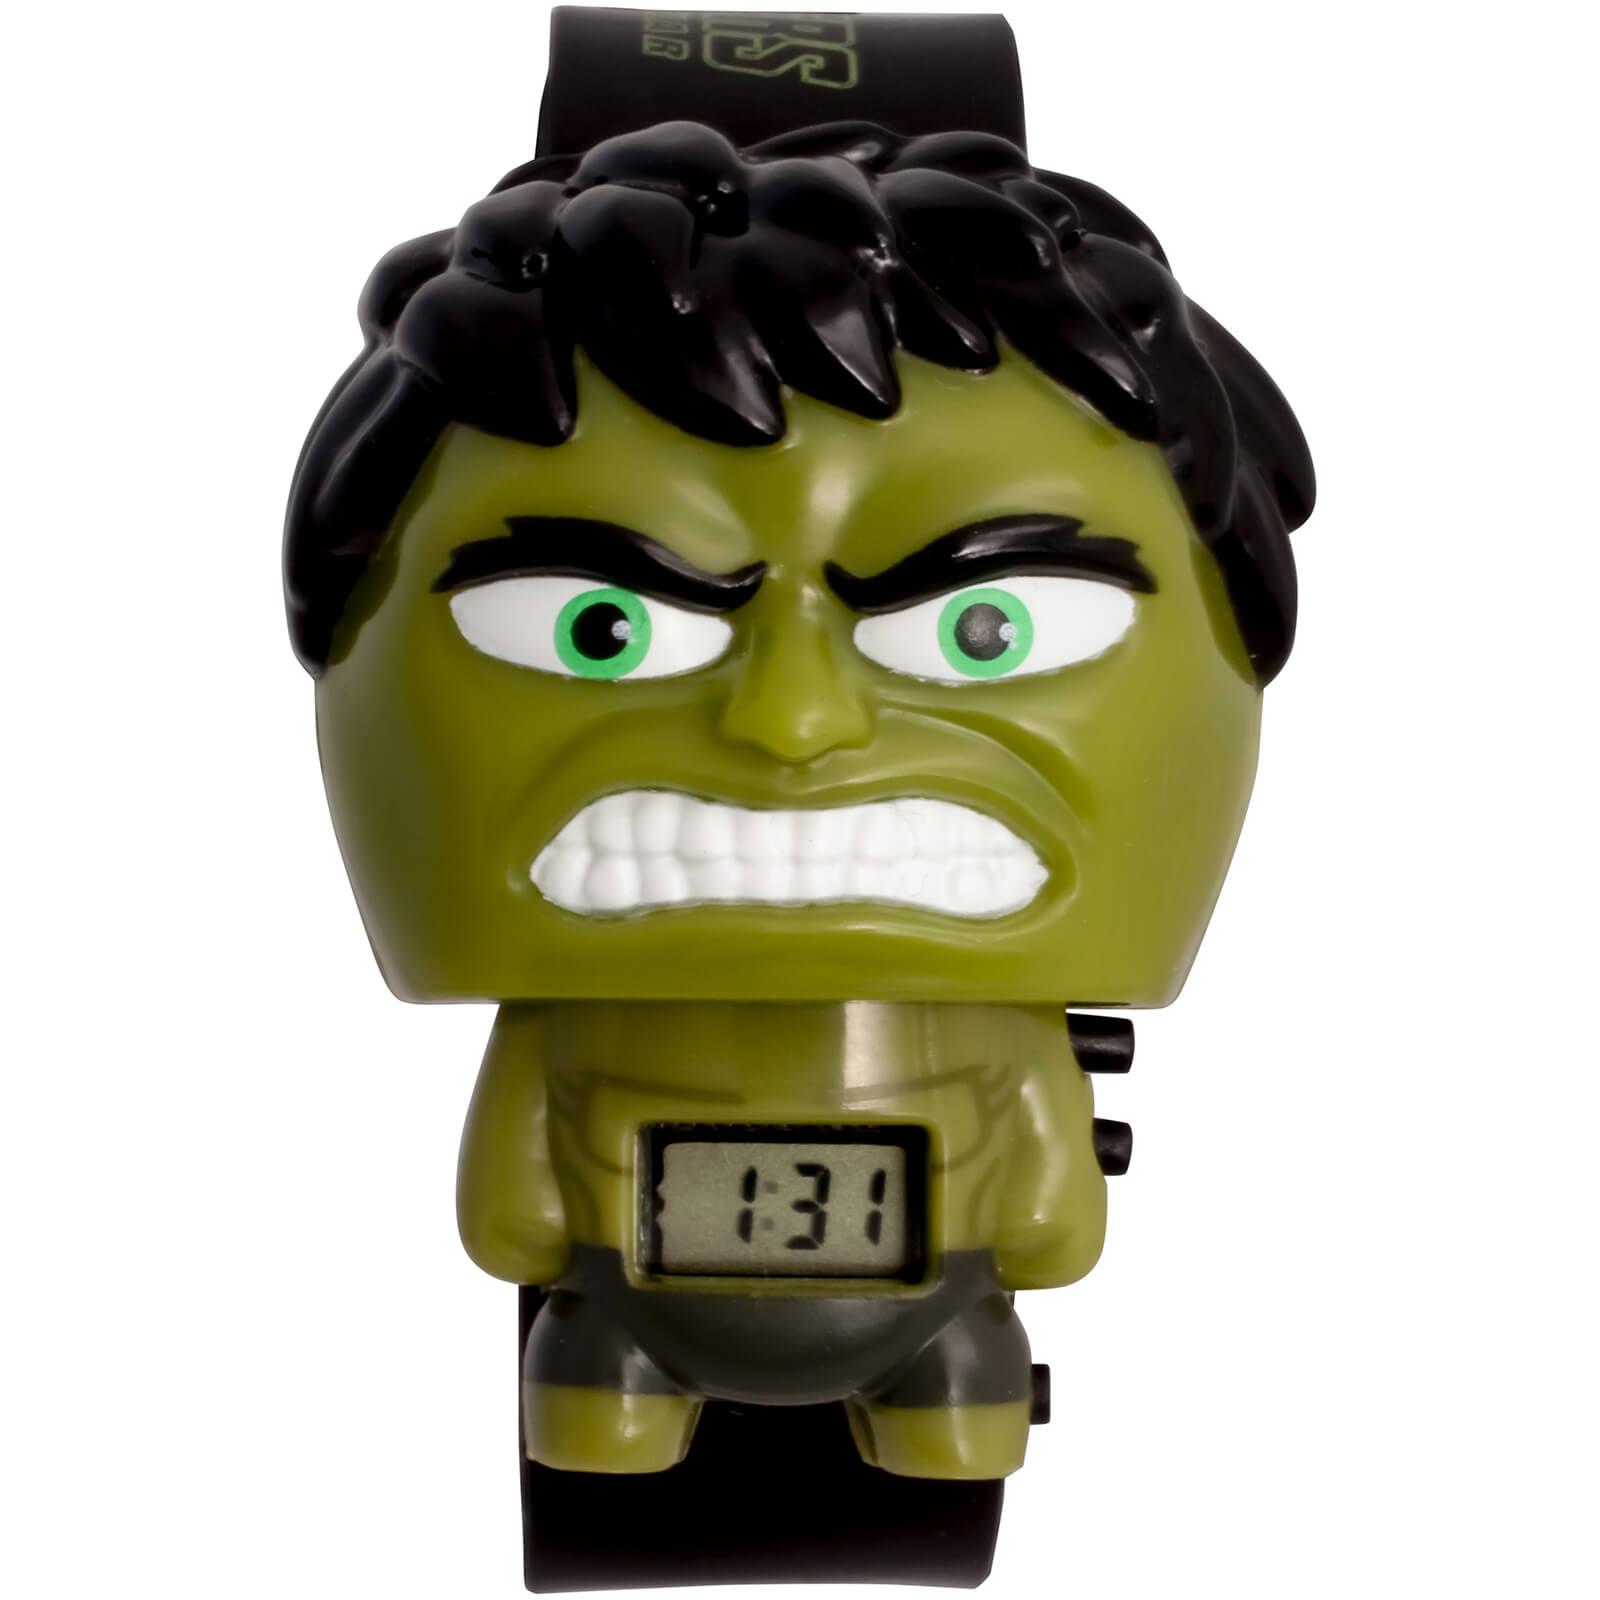 BulbBotz Marvel Avengers: Infinity War Hulk Watch